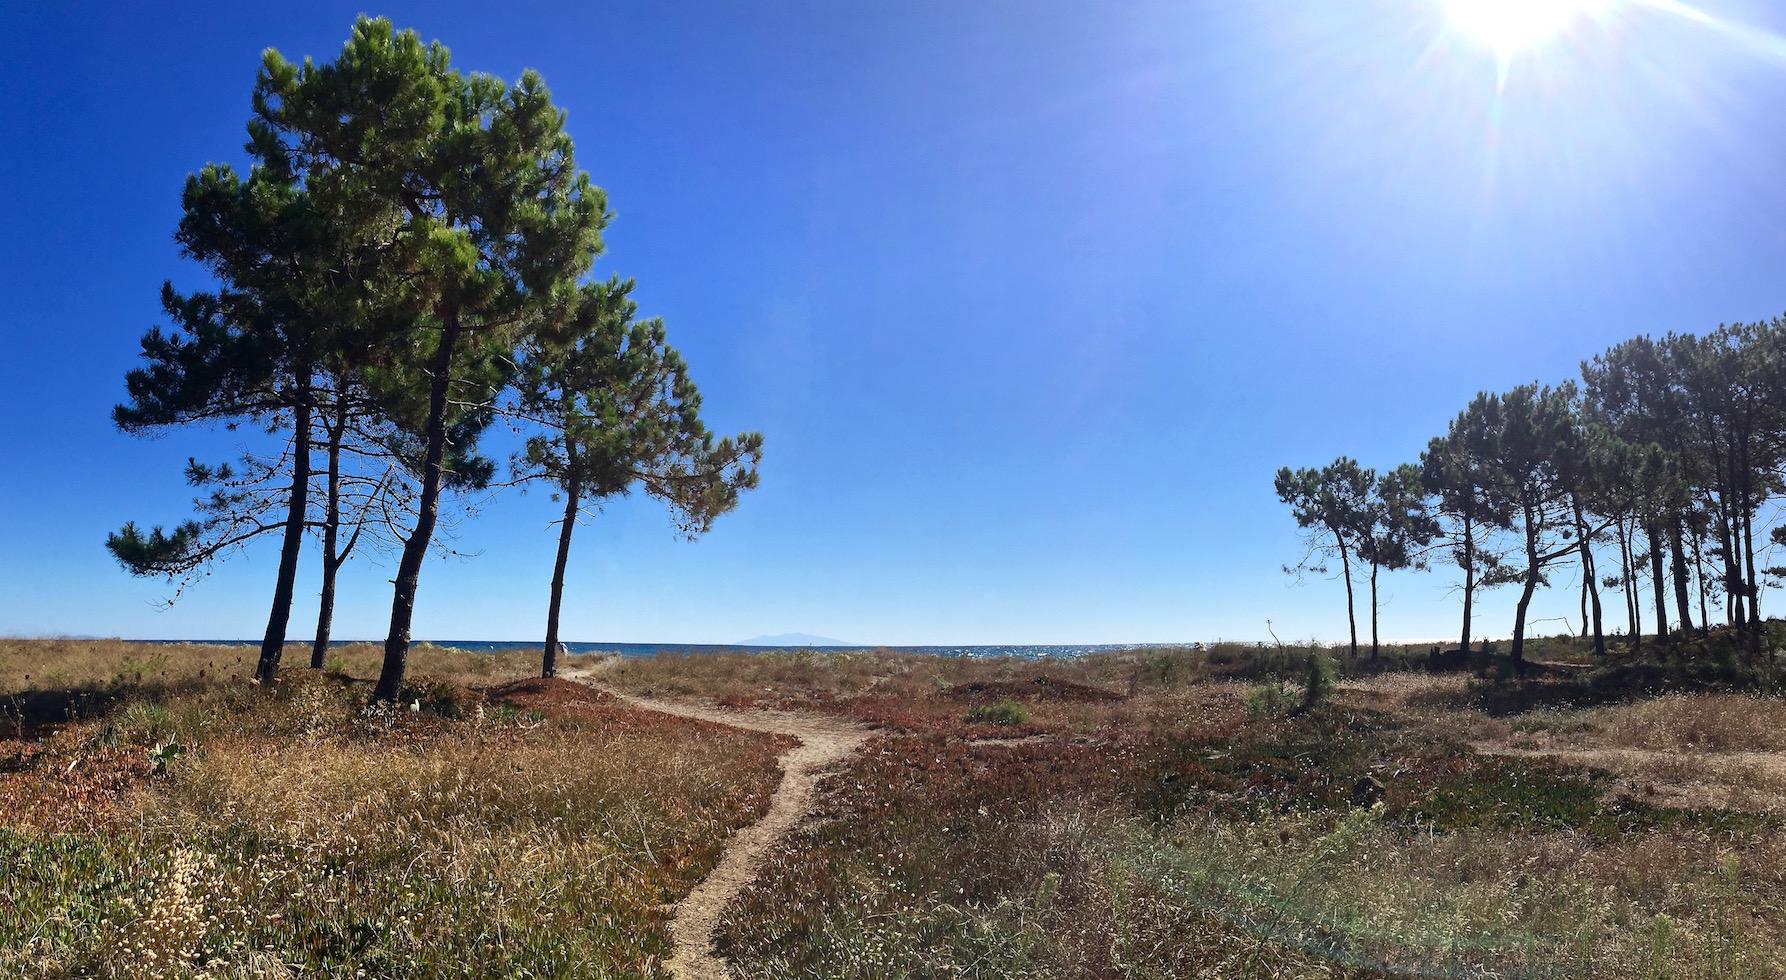 Visiter la Corse : plage de la Marana